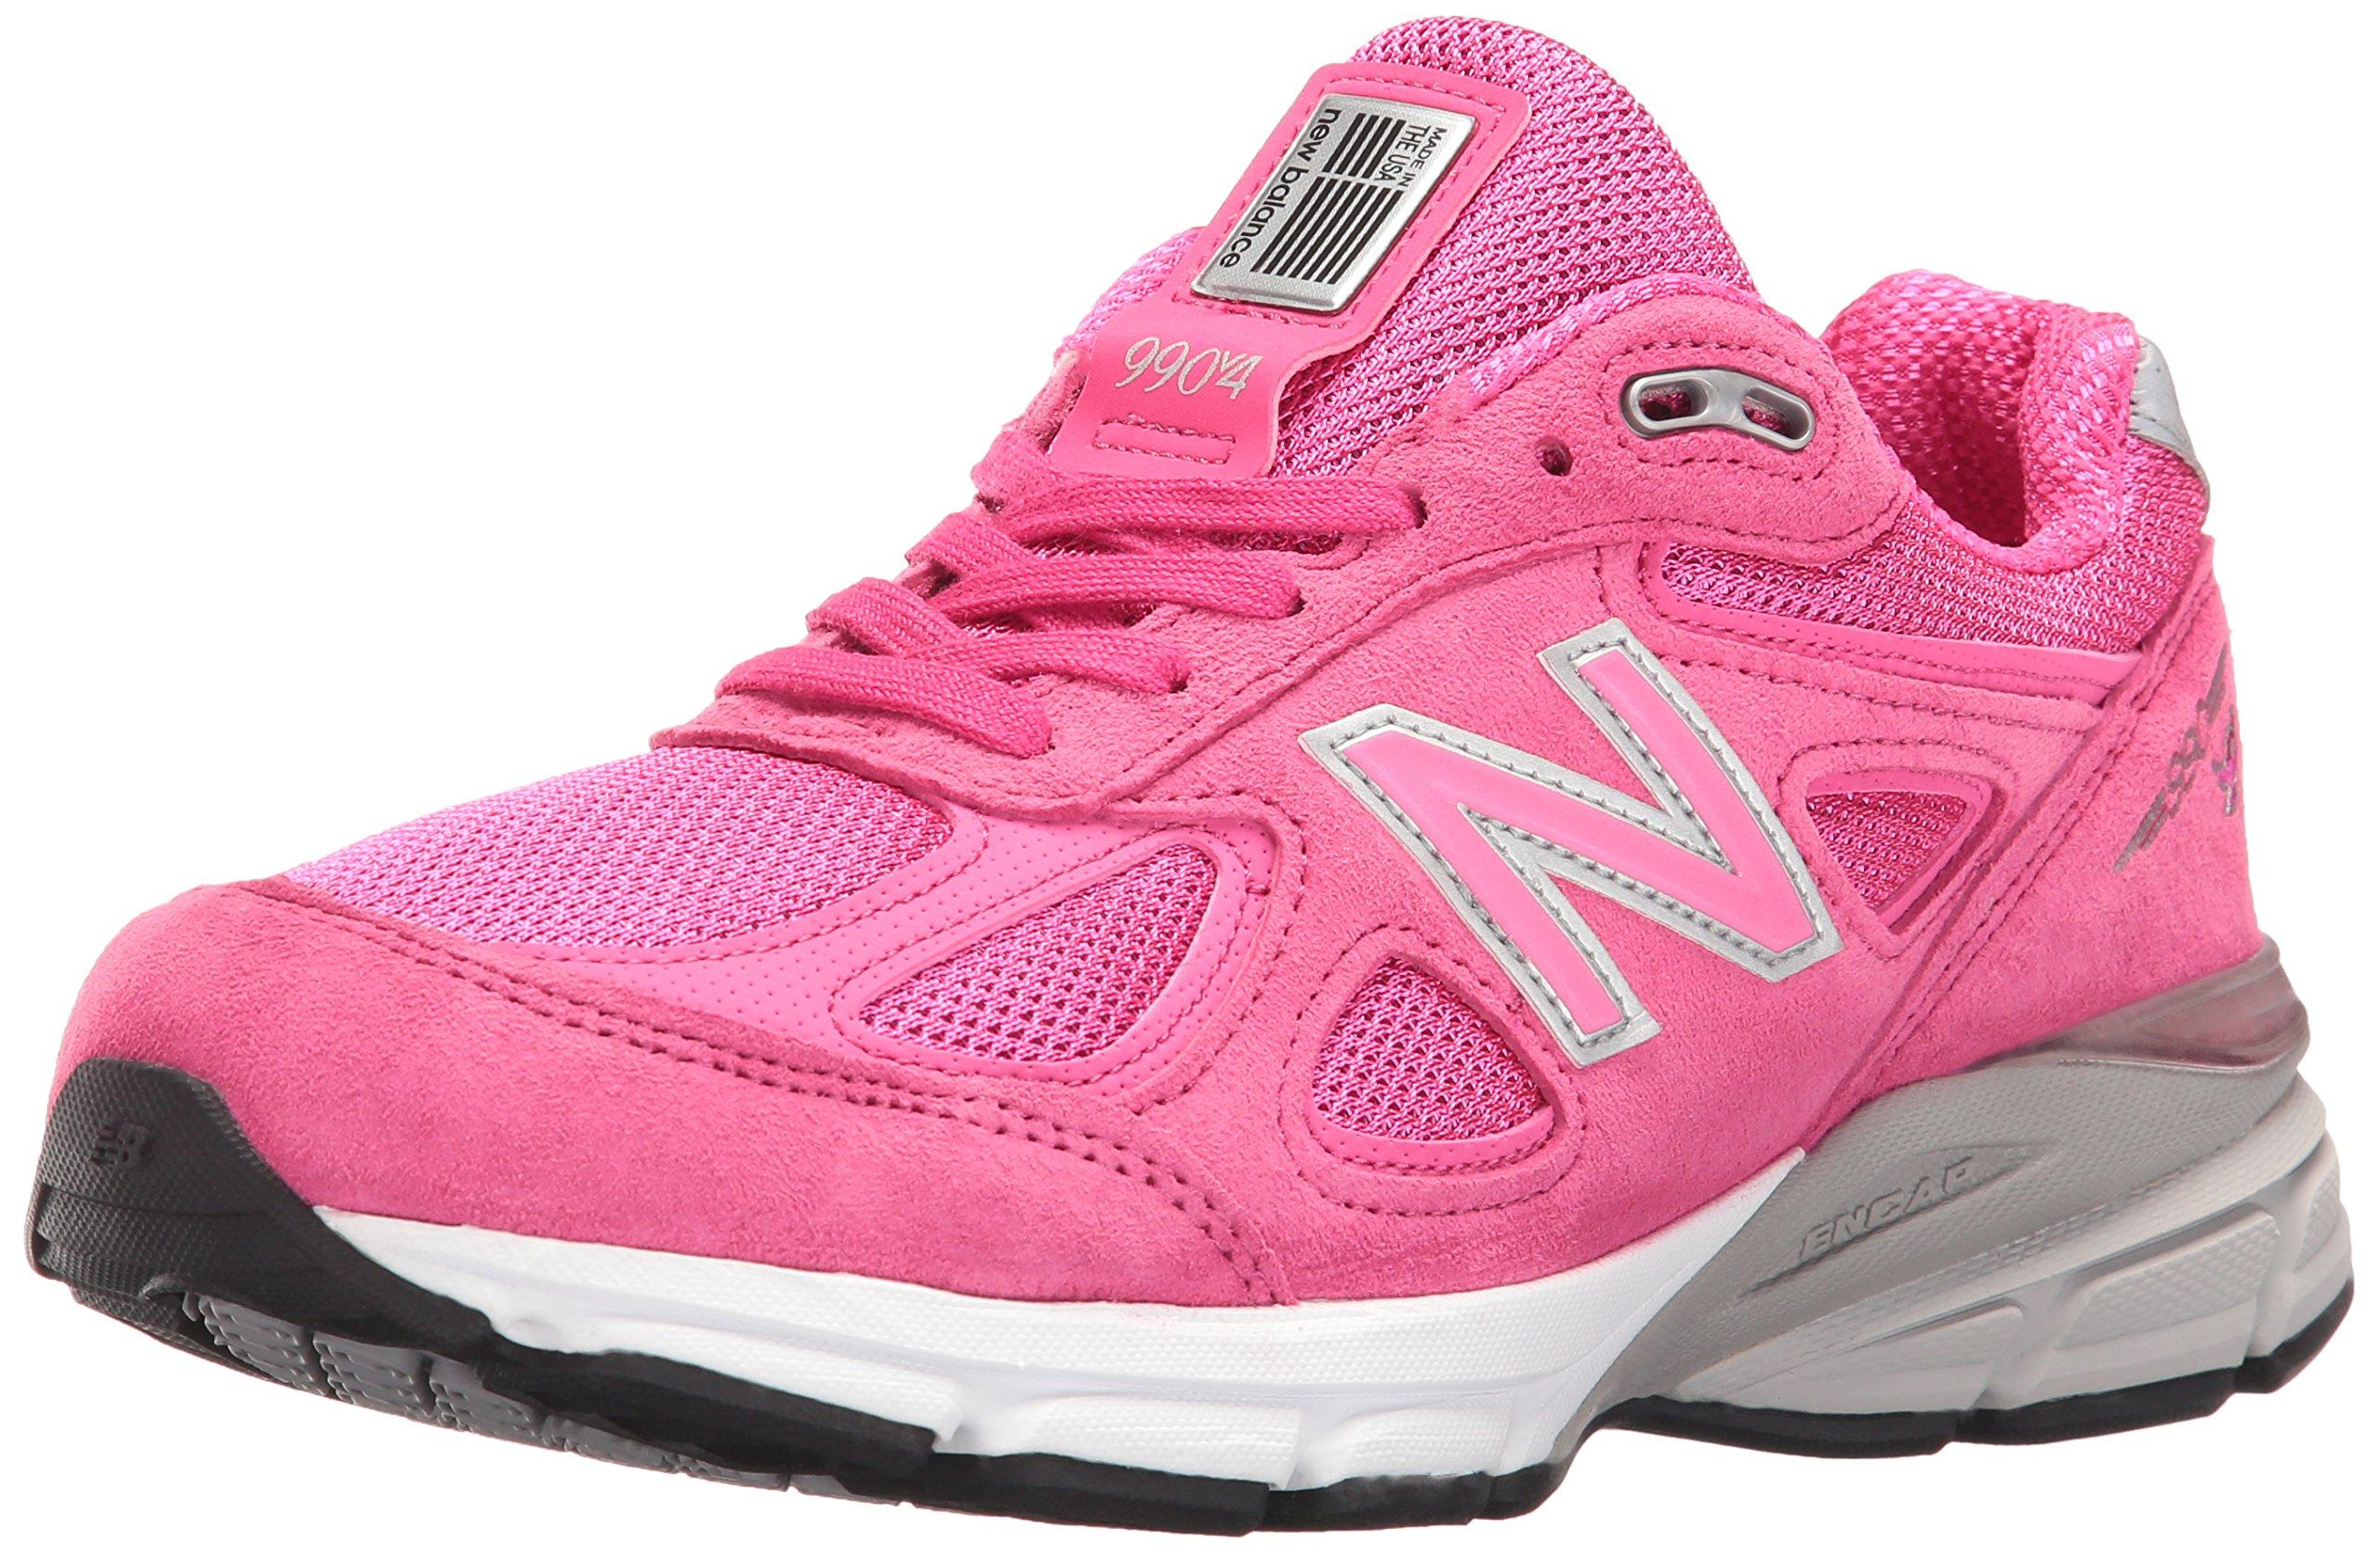 New Balance Women's W990V4 Running Shoes,Komen Pink,5 B US